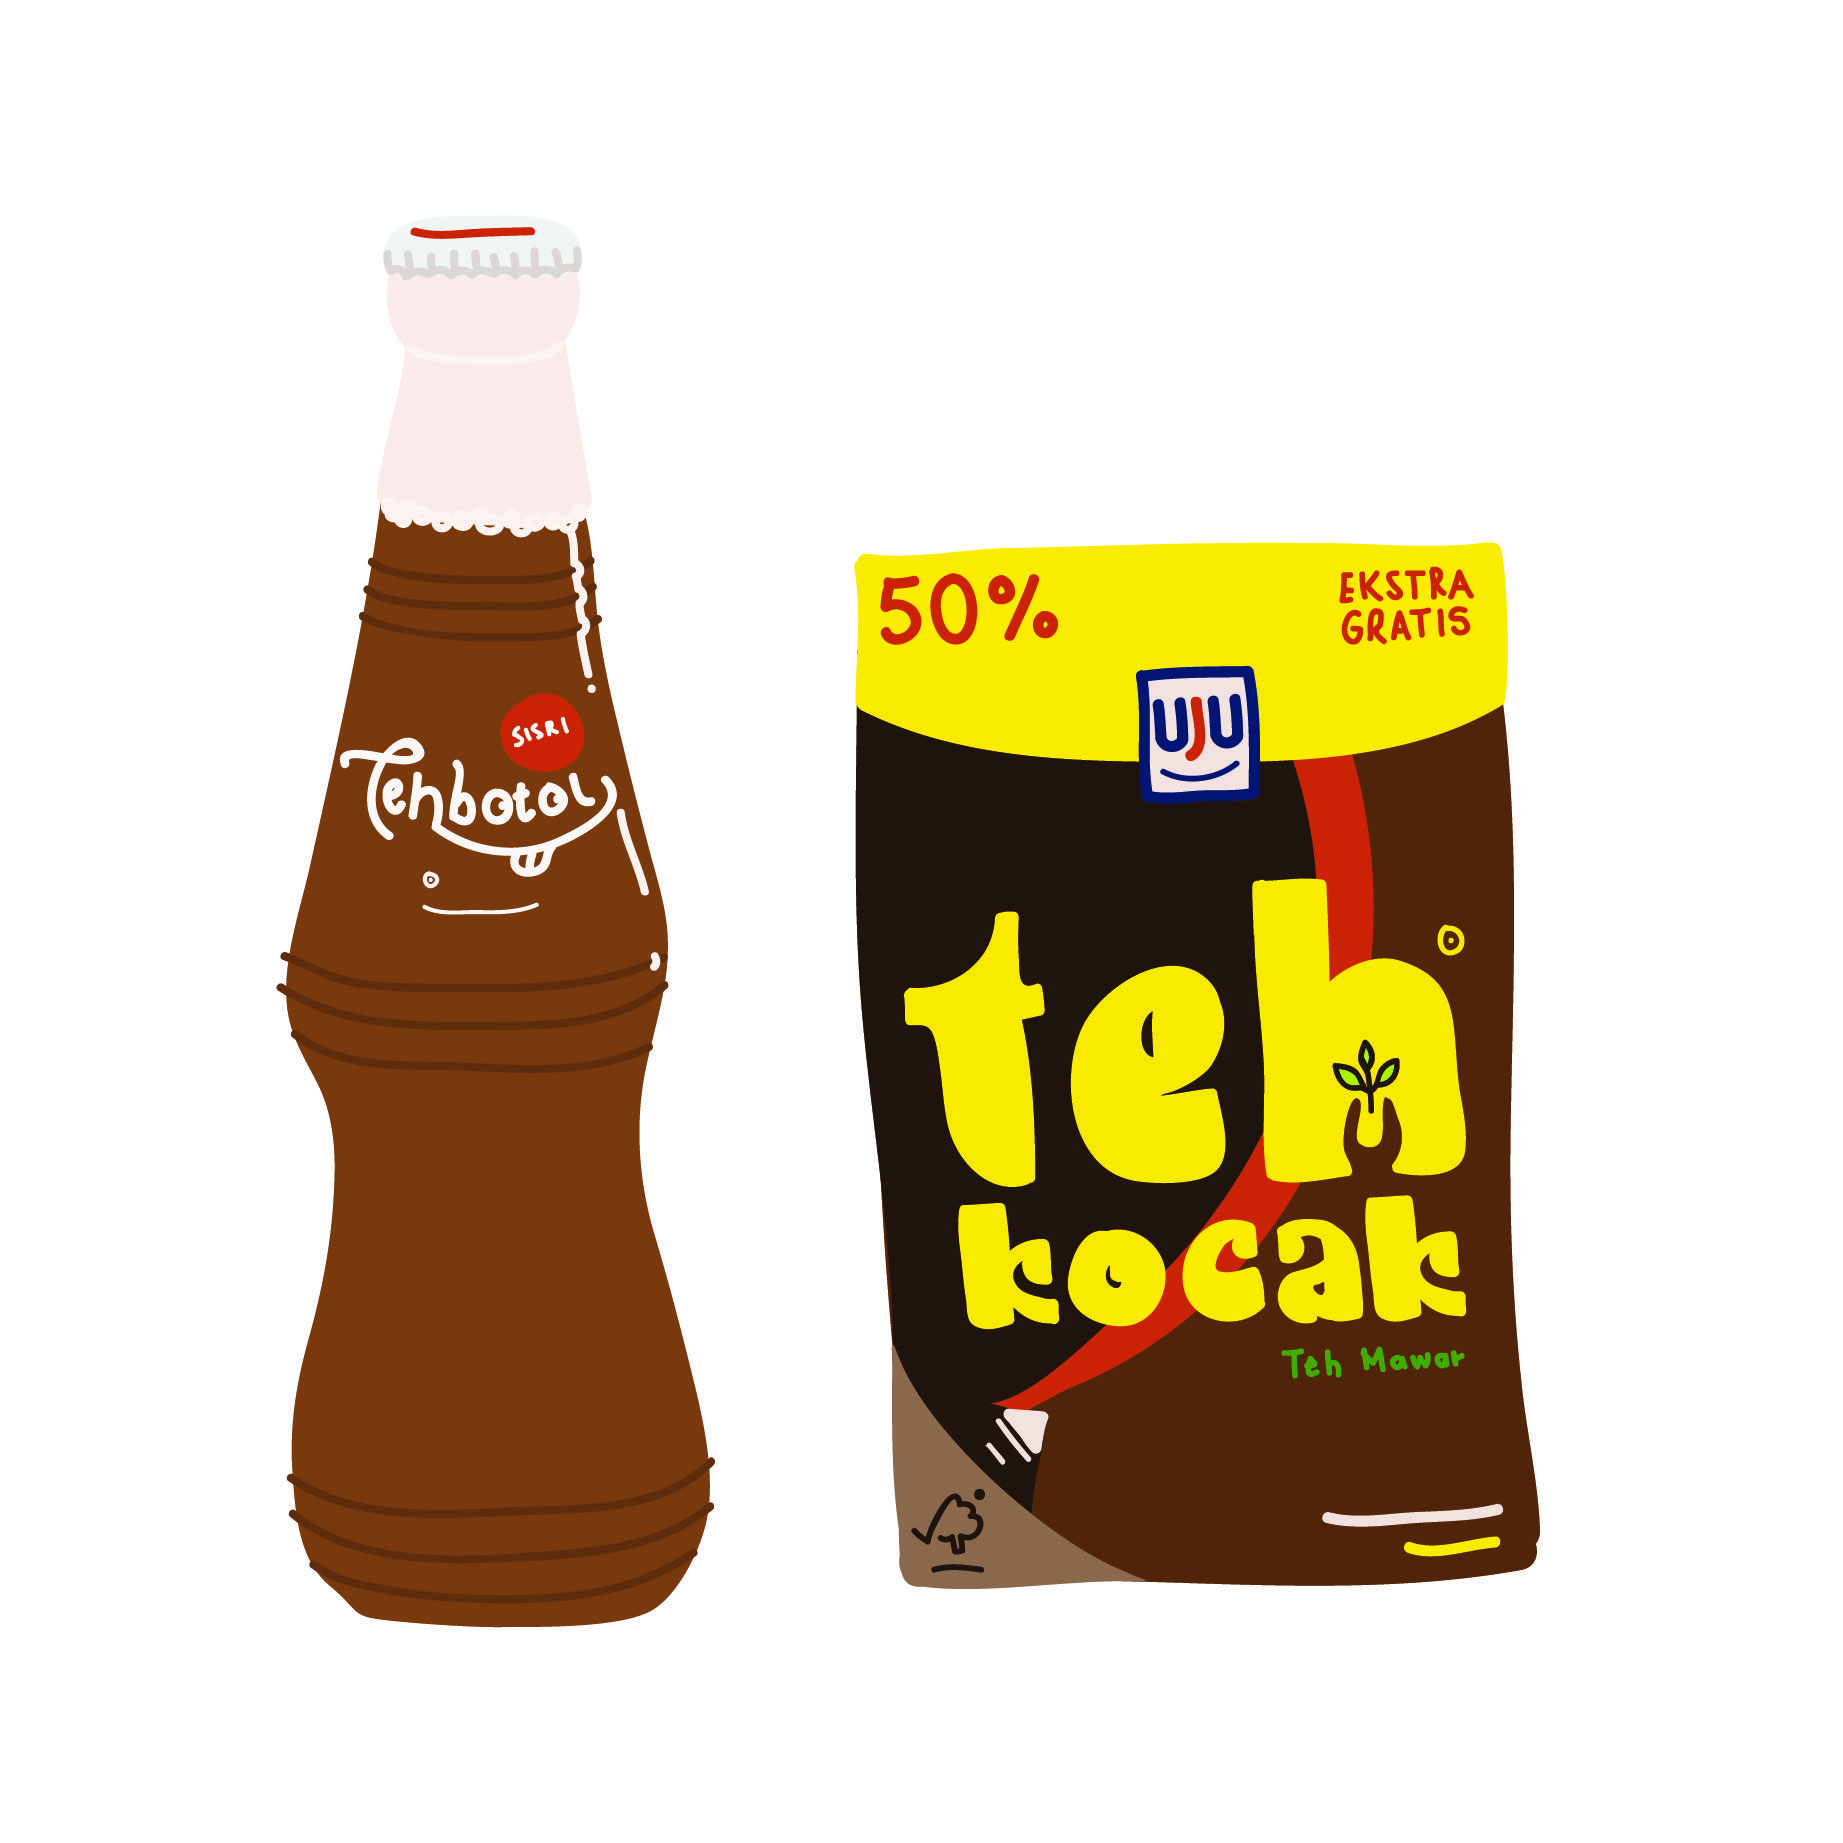 teh botol sosro teh kotak ilustrasi stiker ilustrasi karakter teh botol sosro teh kotak ilustrasi